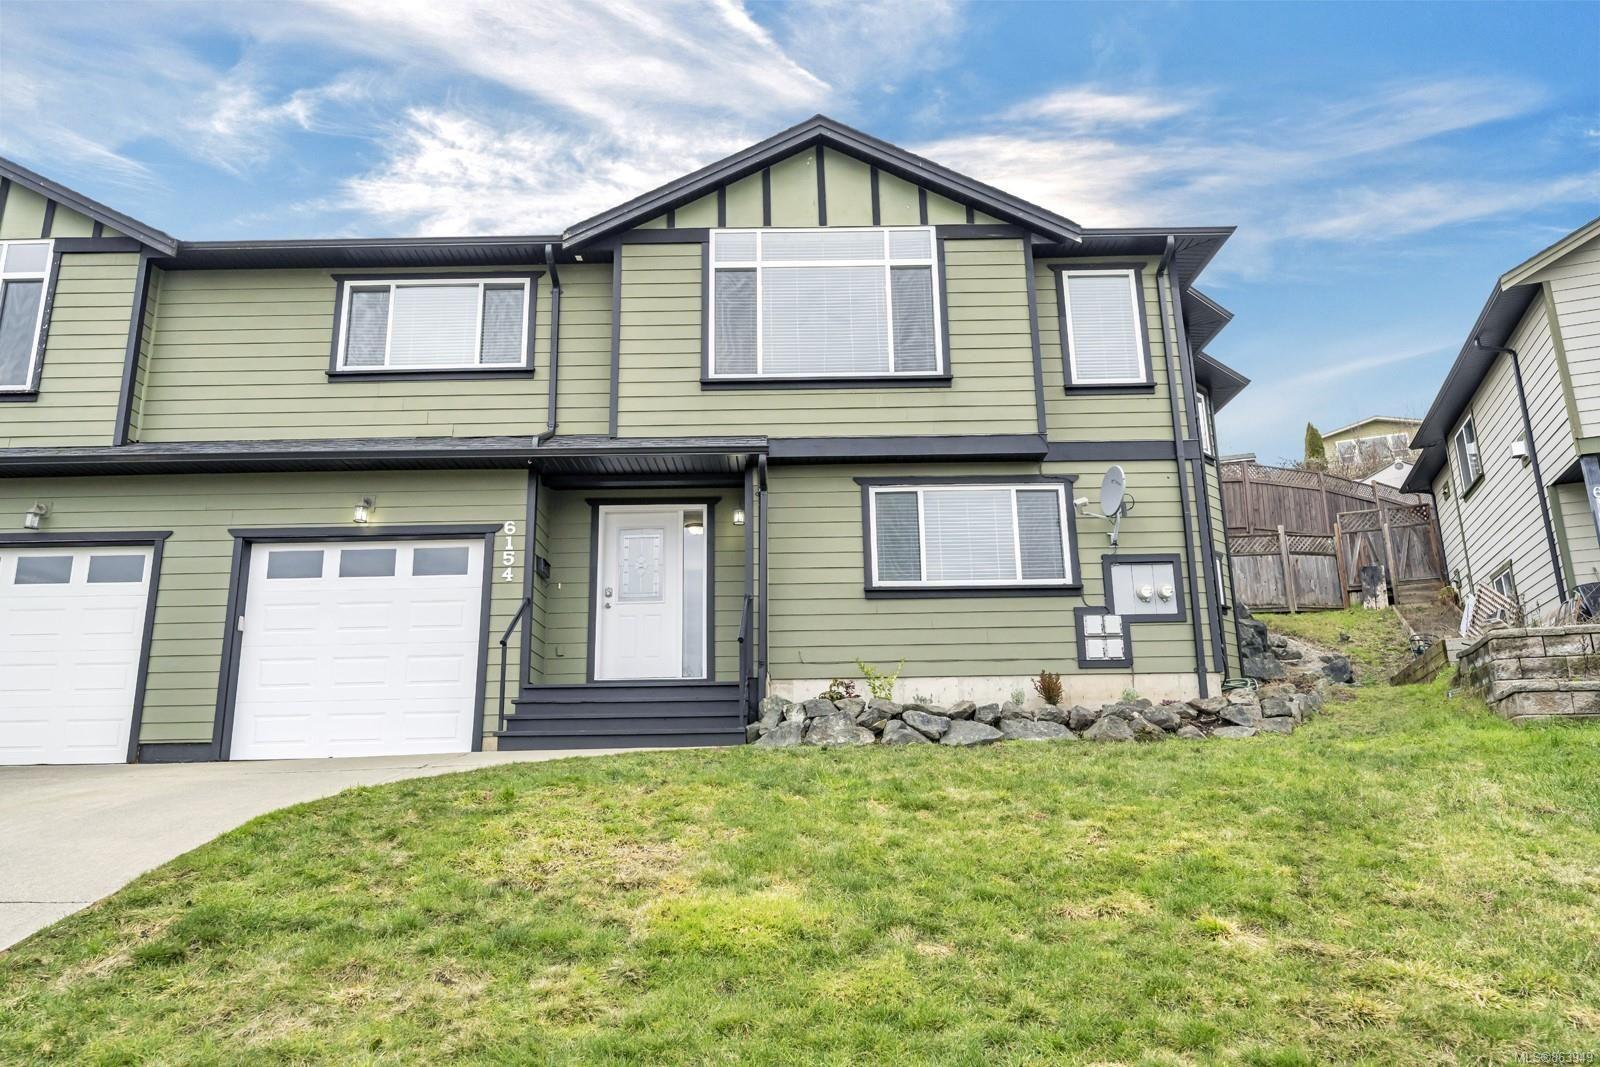 Photo 30: Photos: 6154 Sayward Rd in : Du West Duncan Half Duplex for sale (Duncan)  : MLS®# 863949